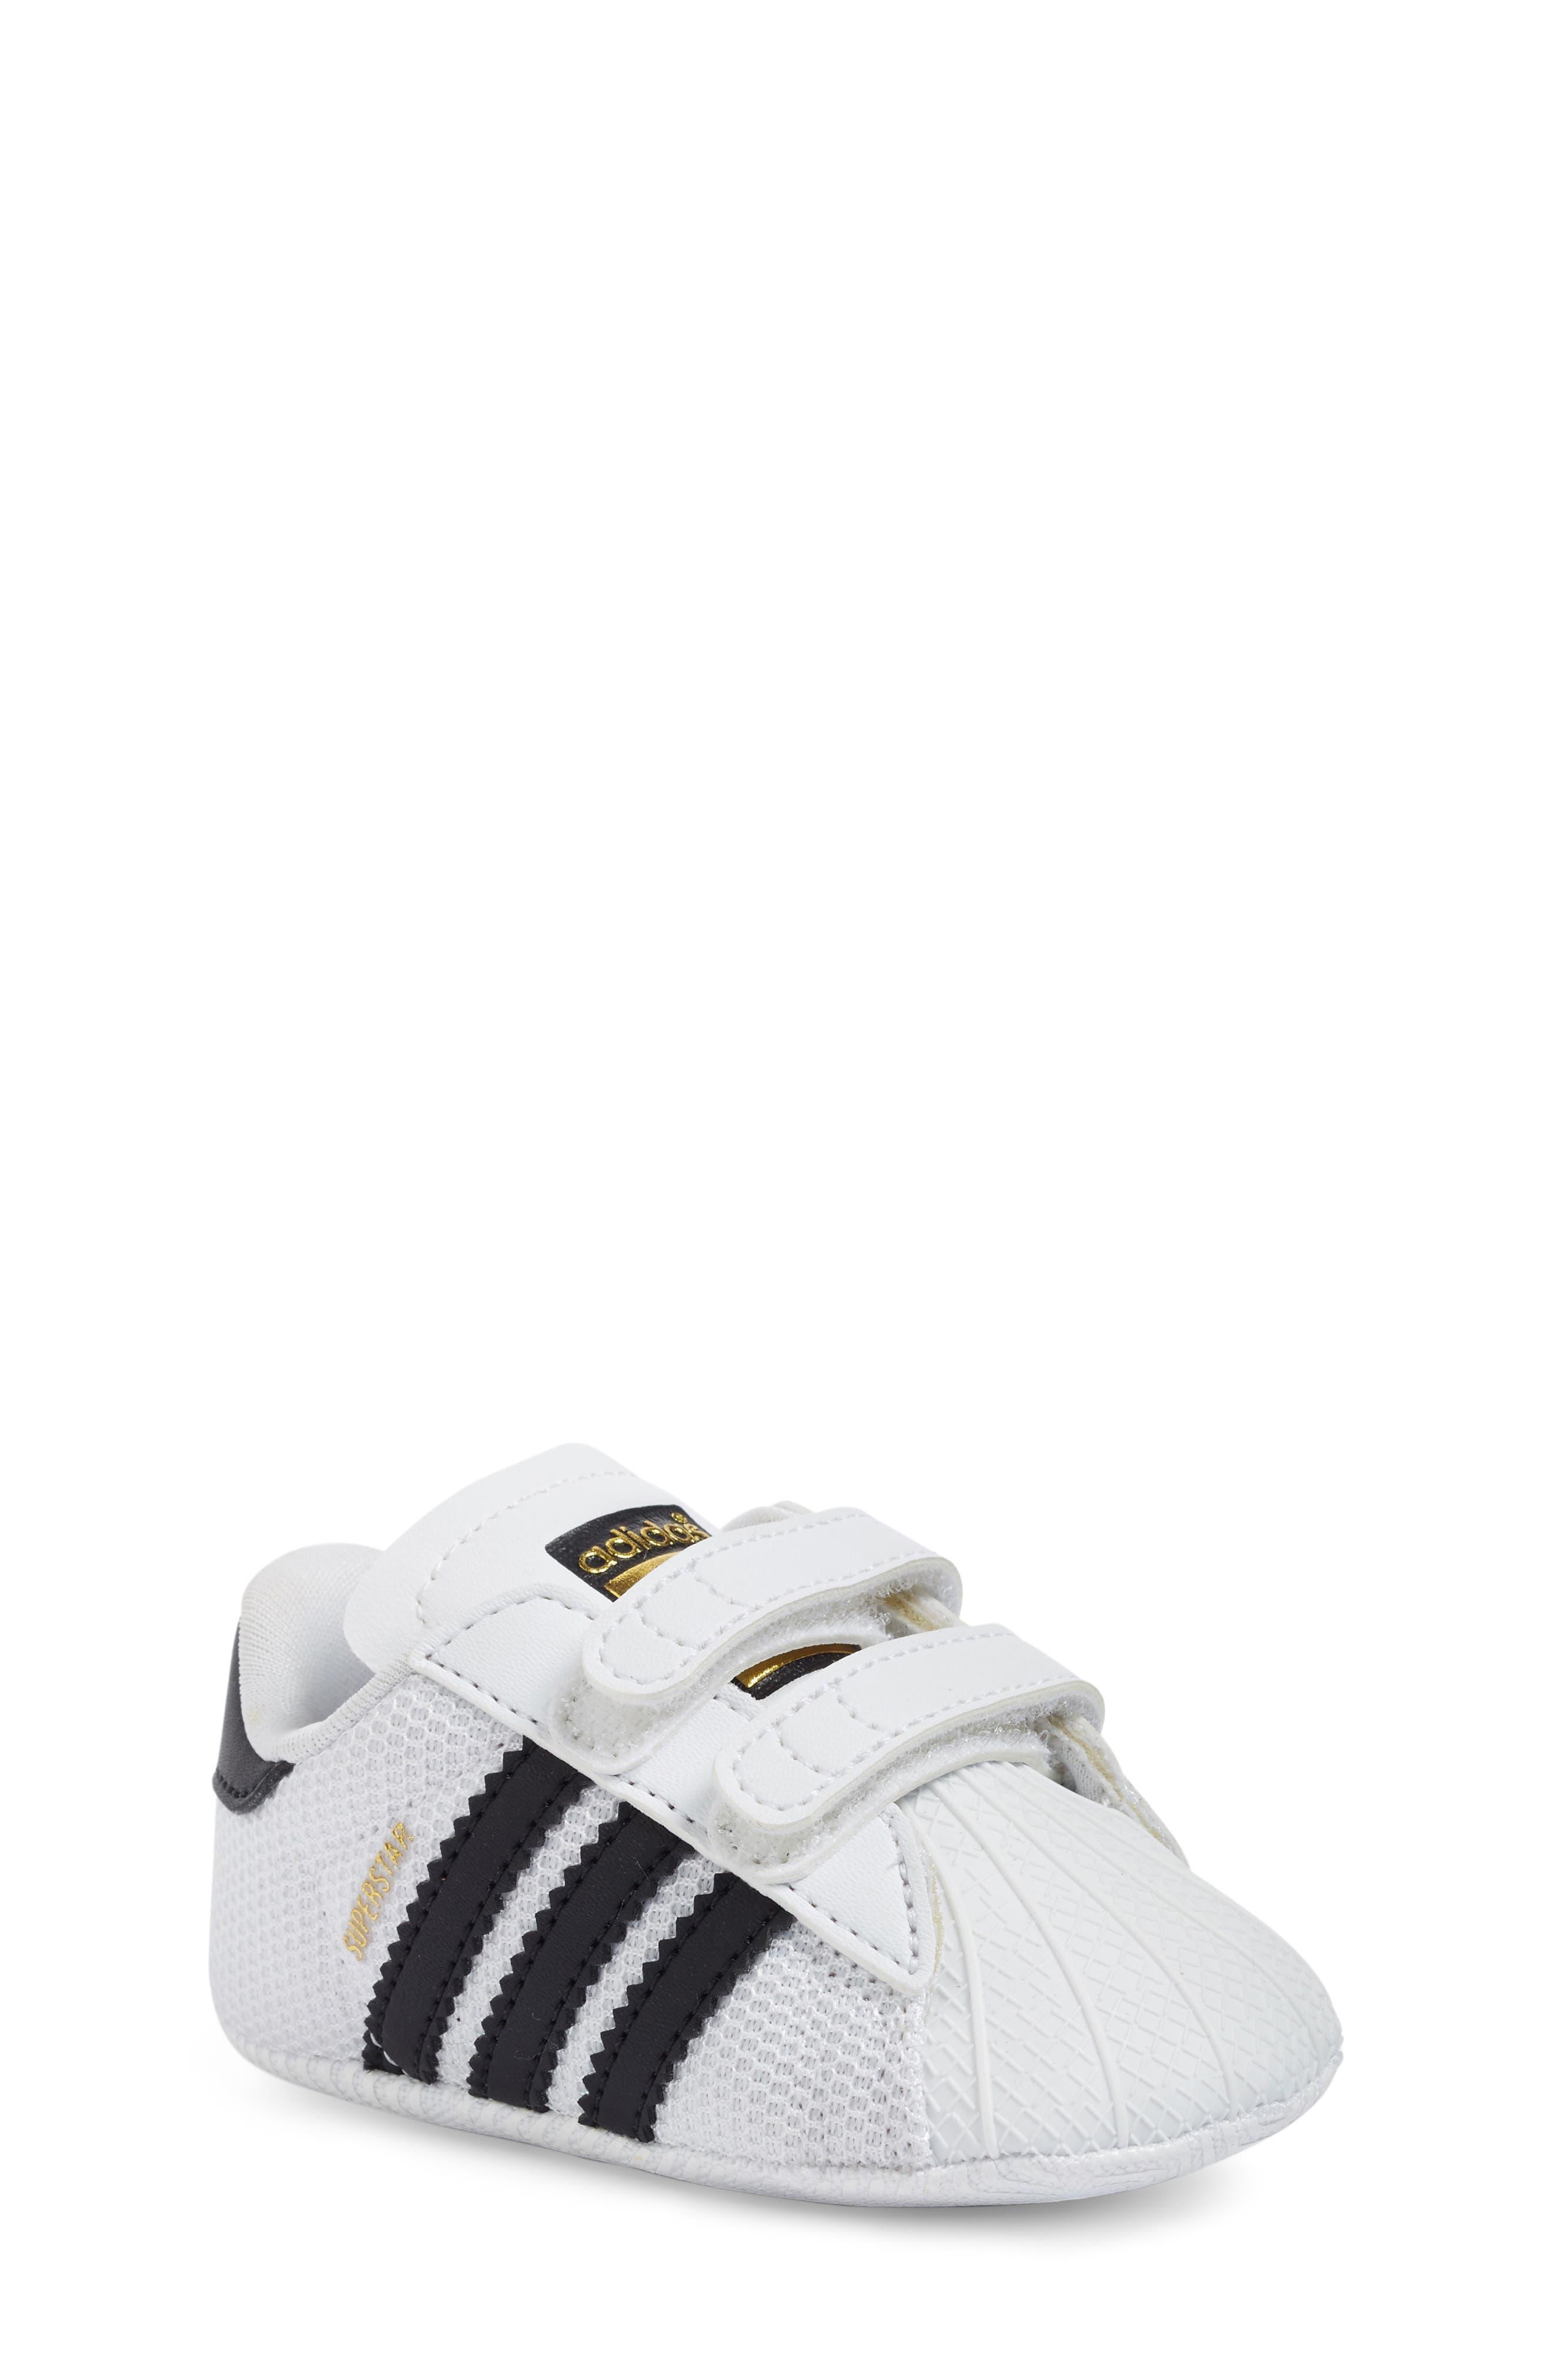 Superstar Sneaker,                         Main,                         color, White/ Black